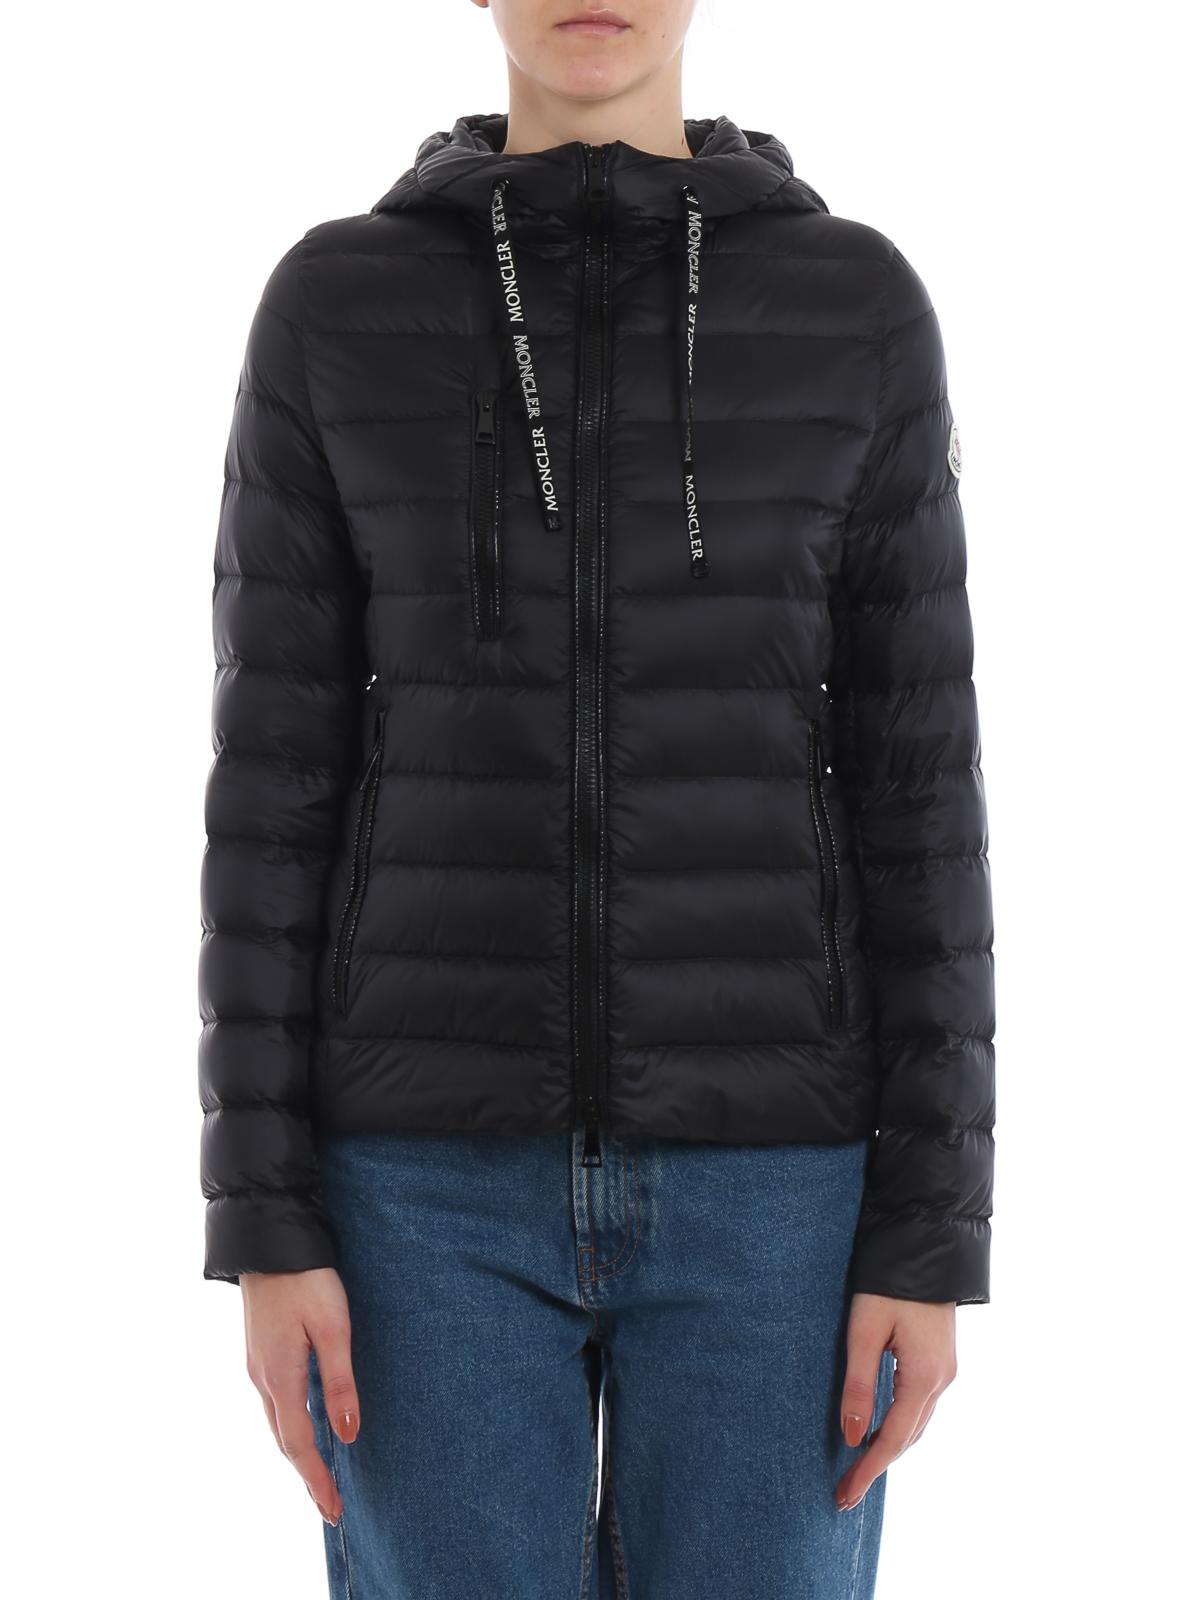 3458ce1aa Moncler - Seoul black hooded puffer jacket - padded jackets - E1 093 ...